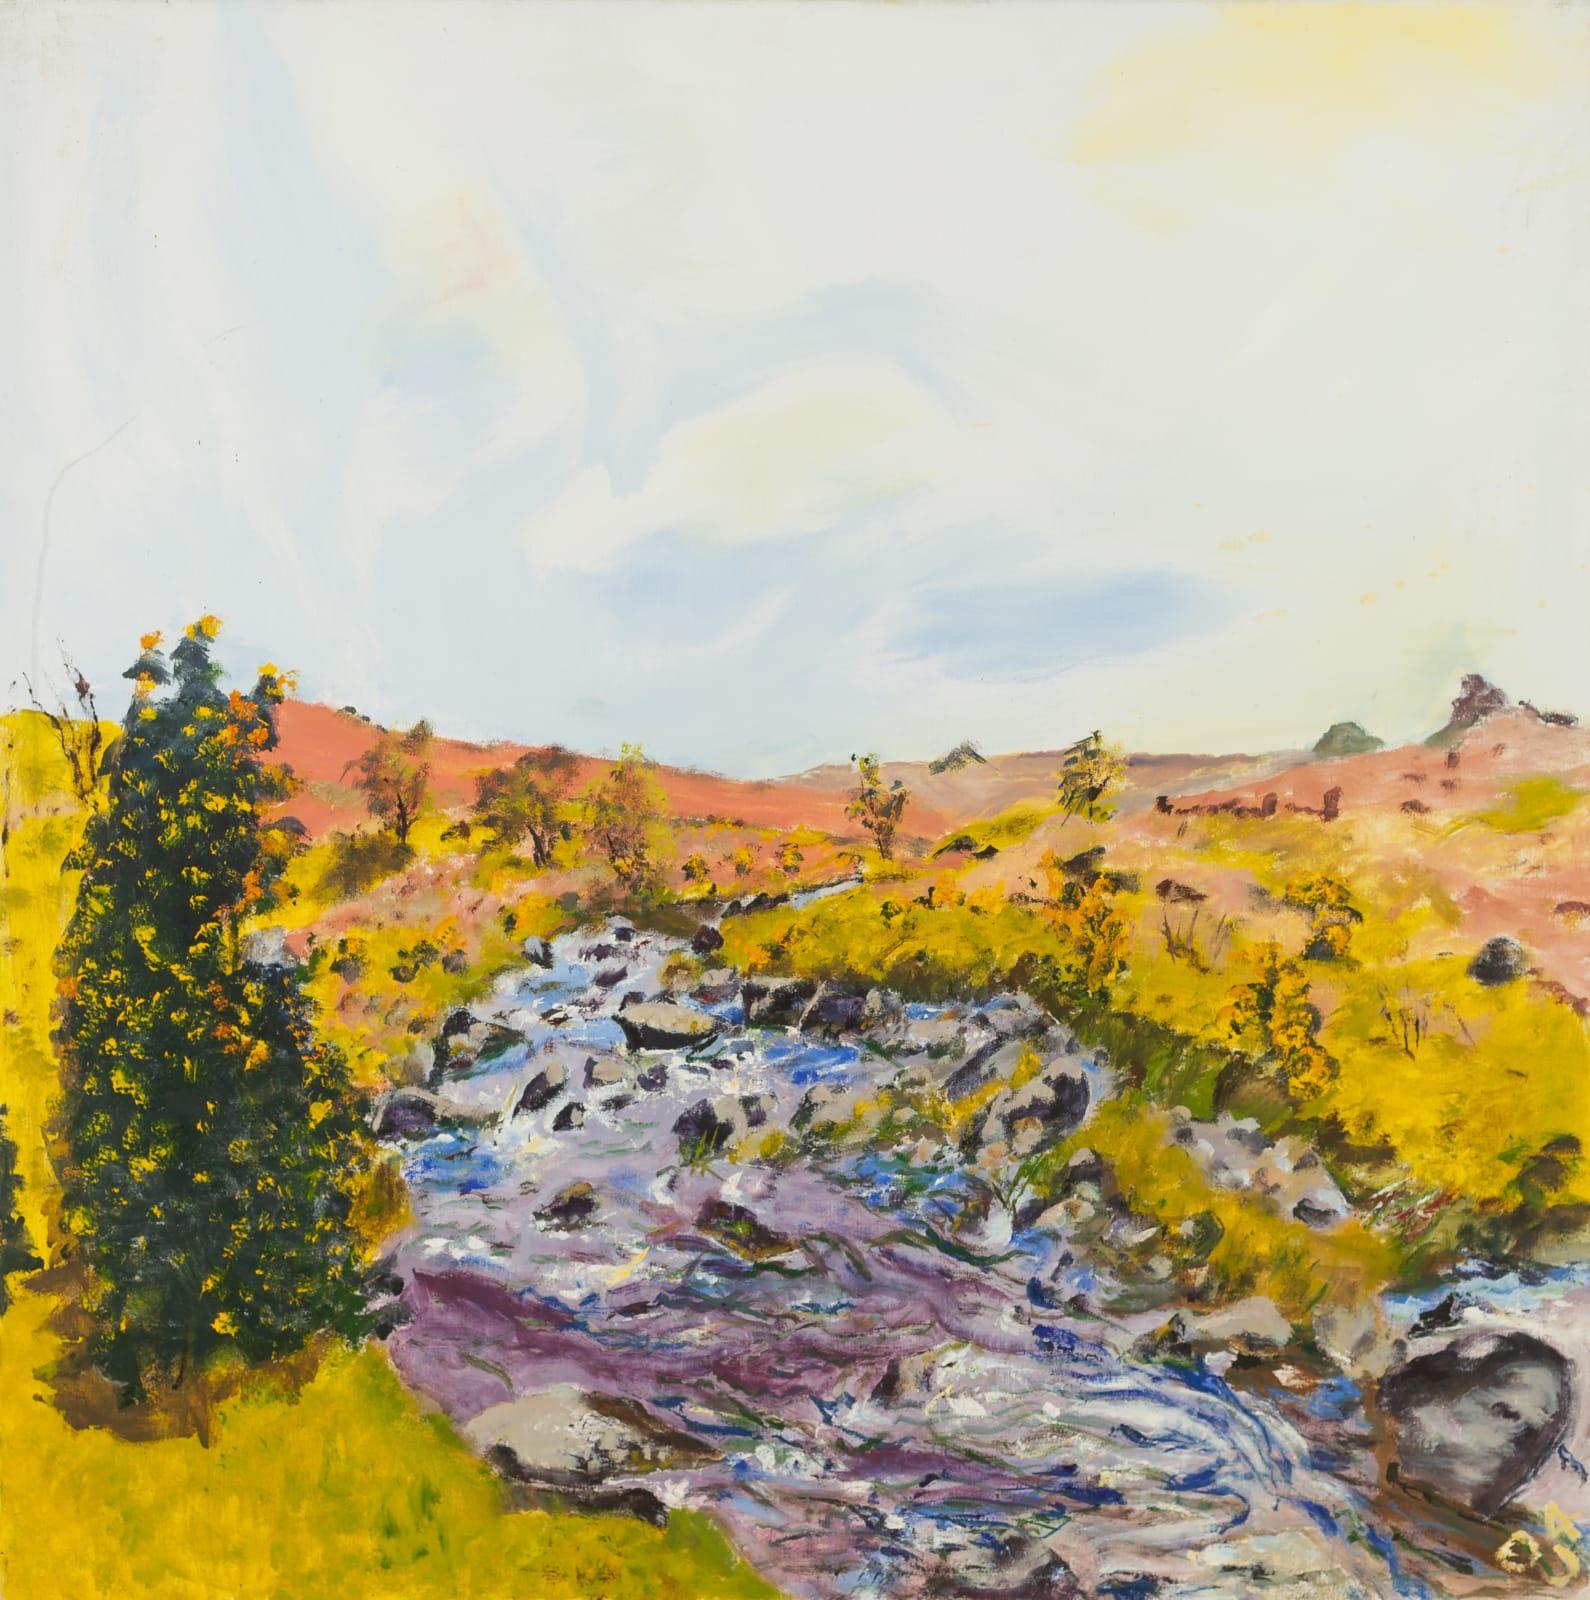 JEAN JONES, Untitled (The River Plym), 2004